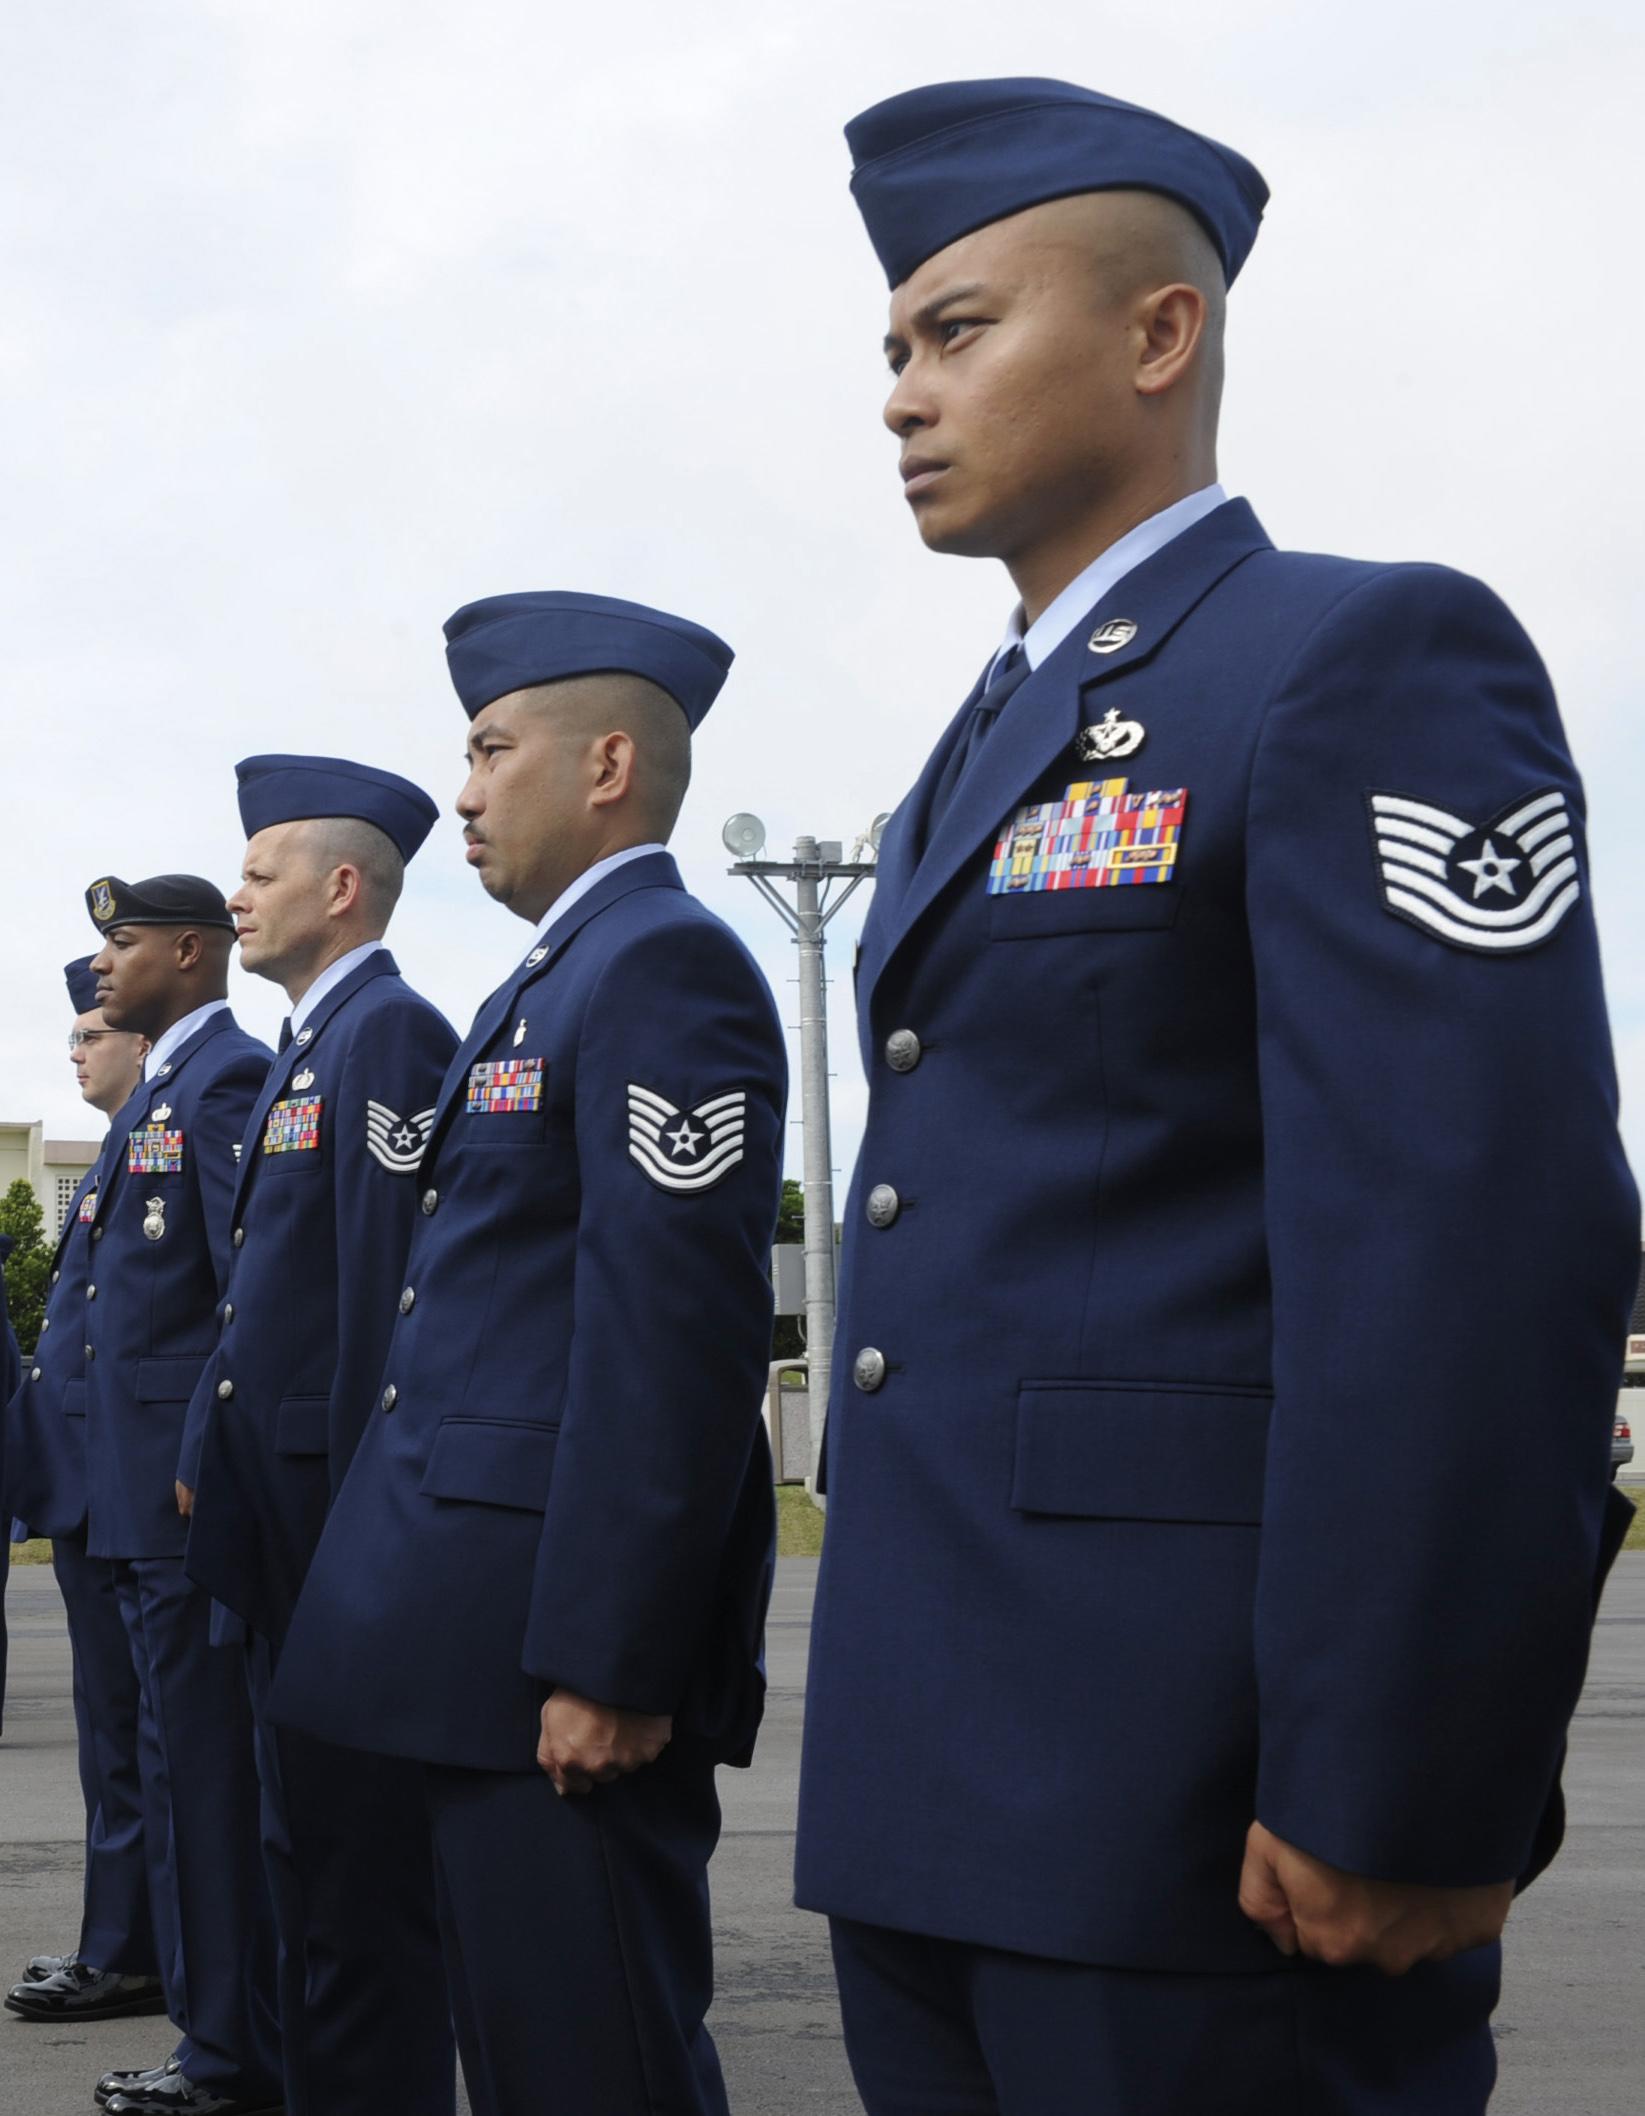 Af Blues Uniform Regulations